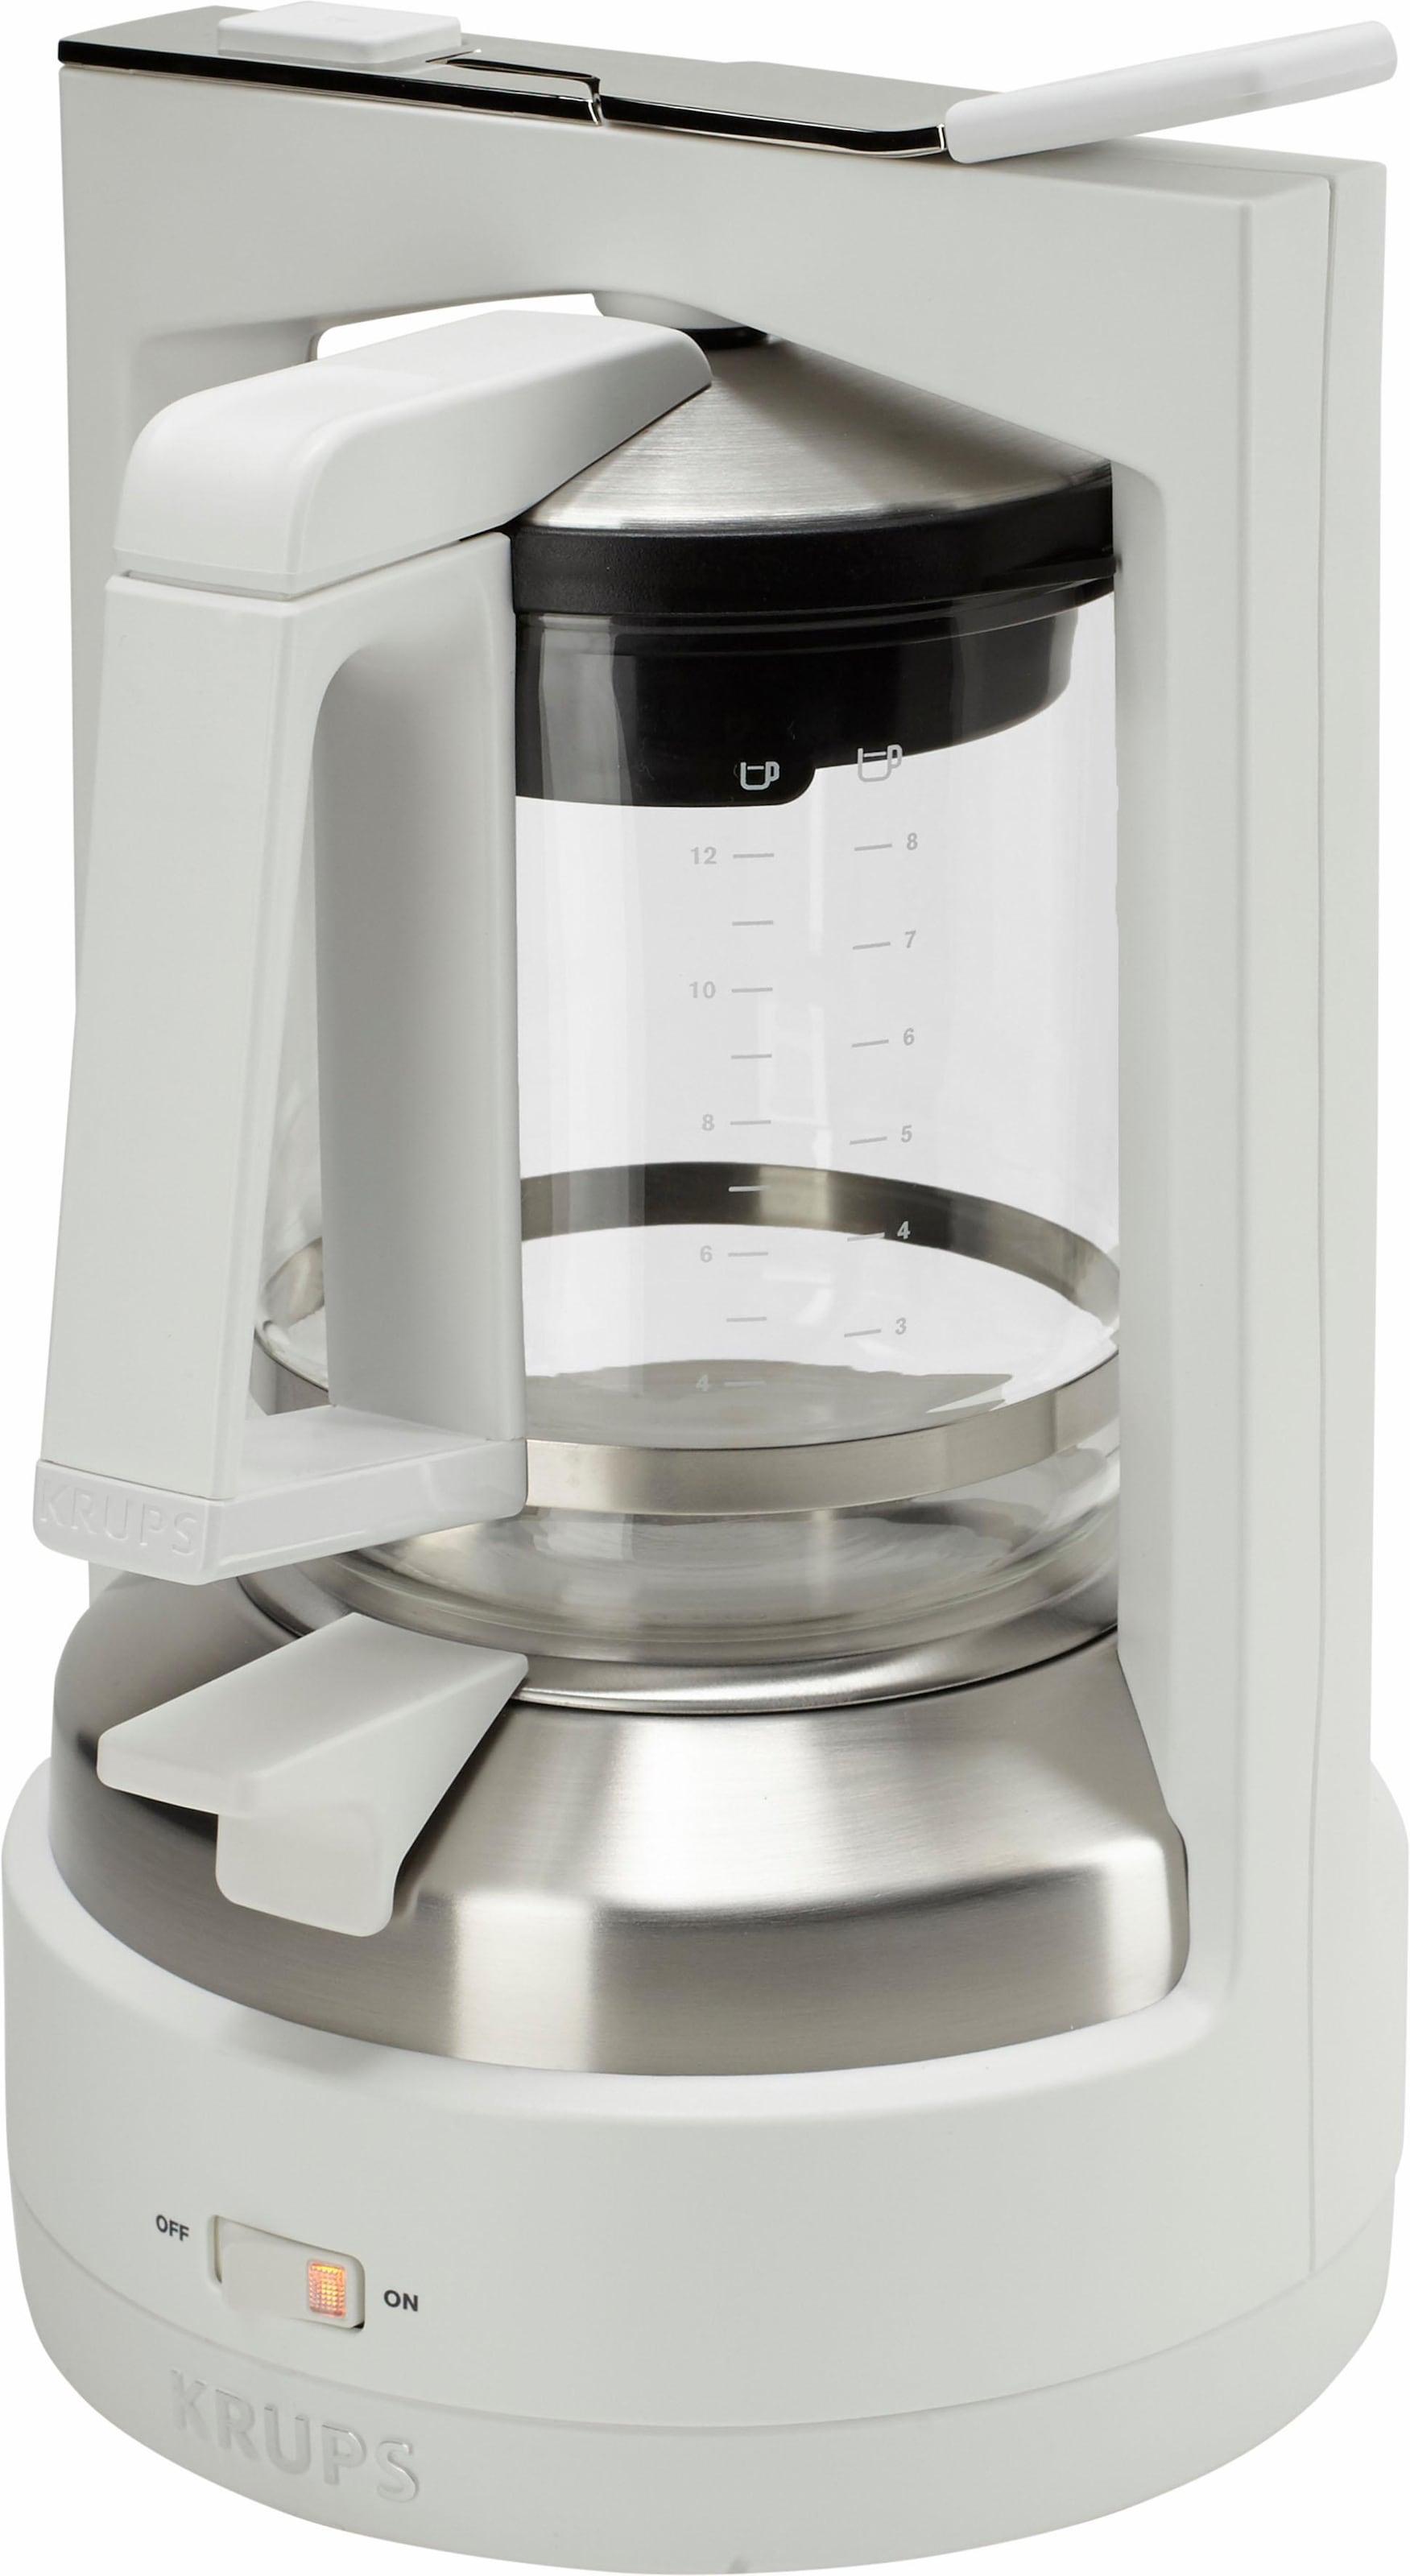 Krups Kaffeemaschine ProAroma F 309 01 F30901 weiss matt